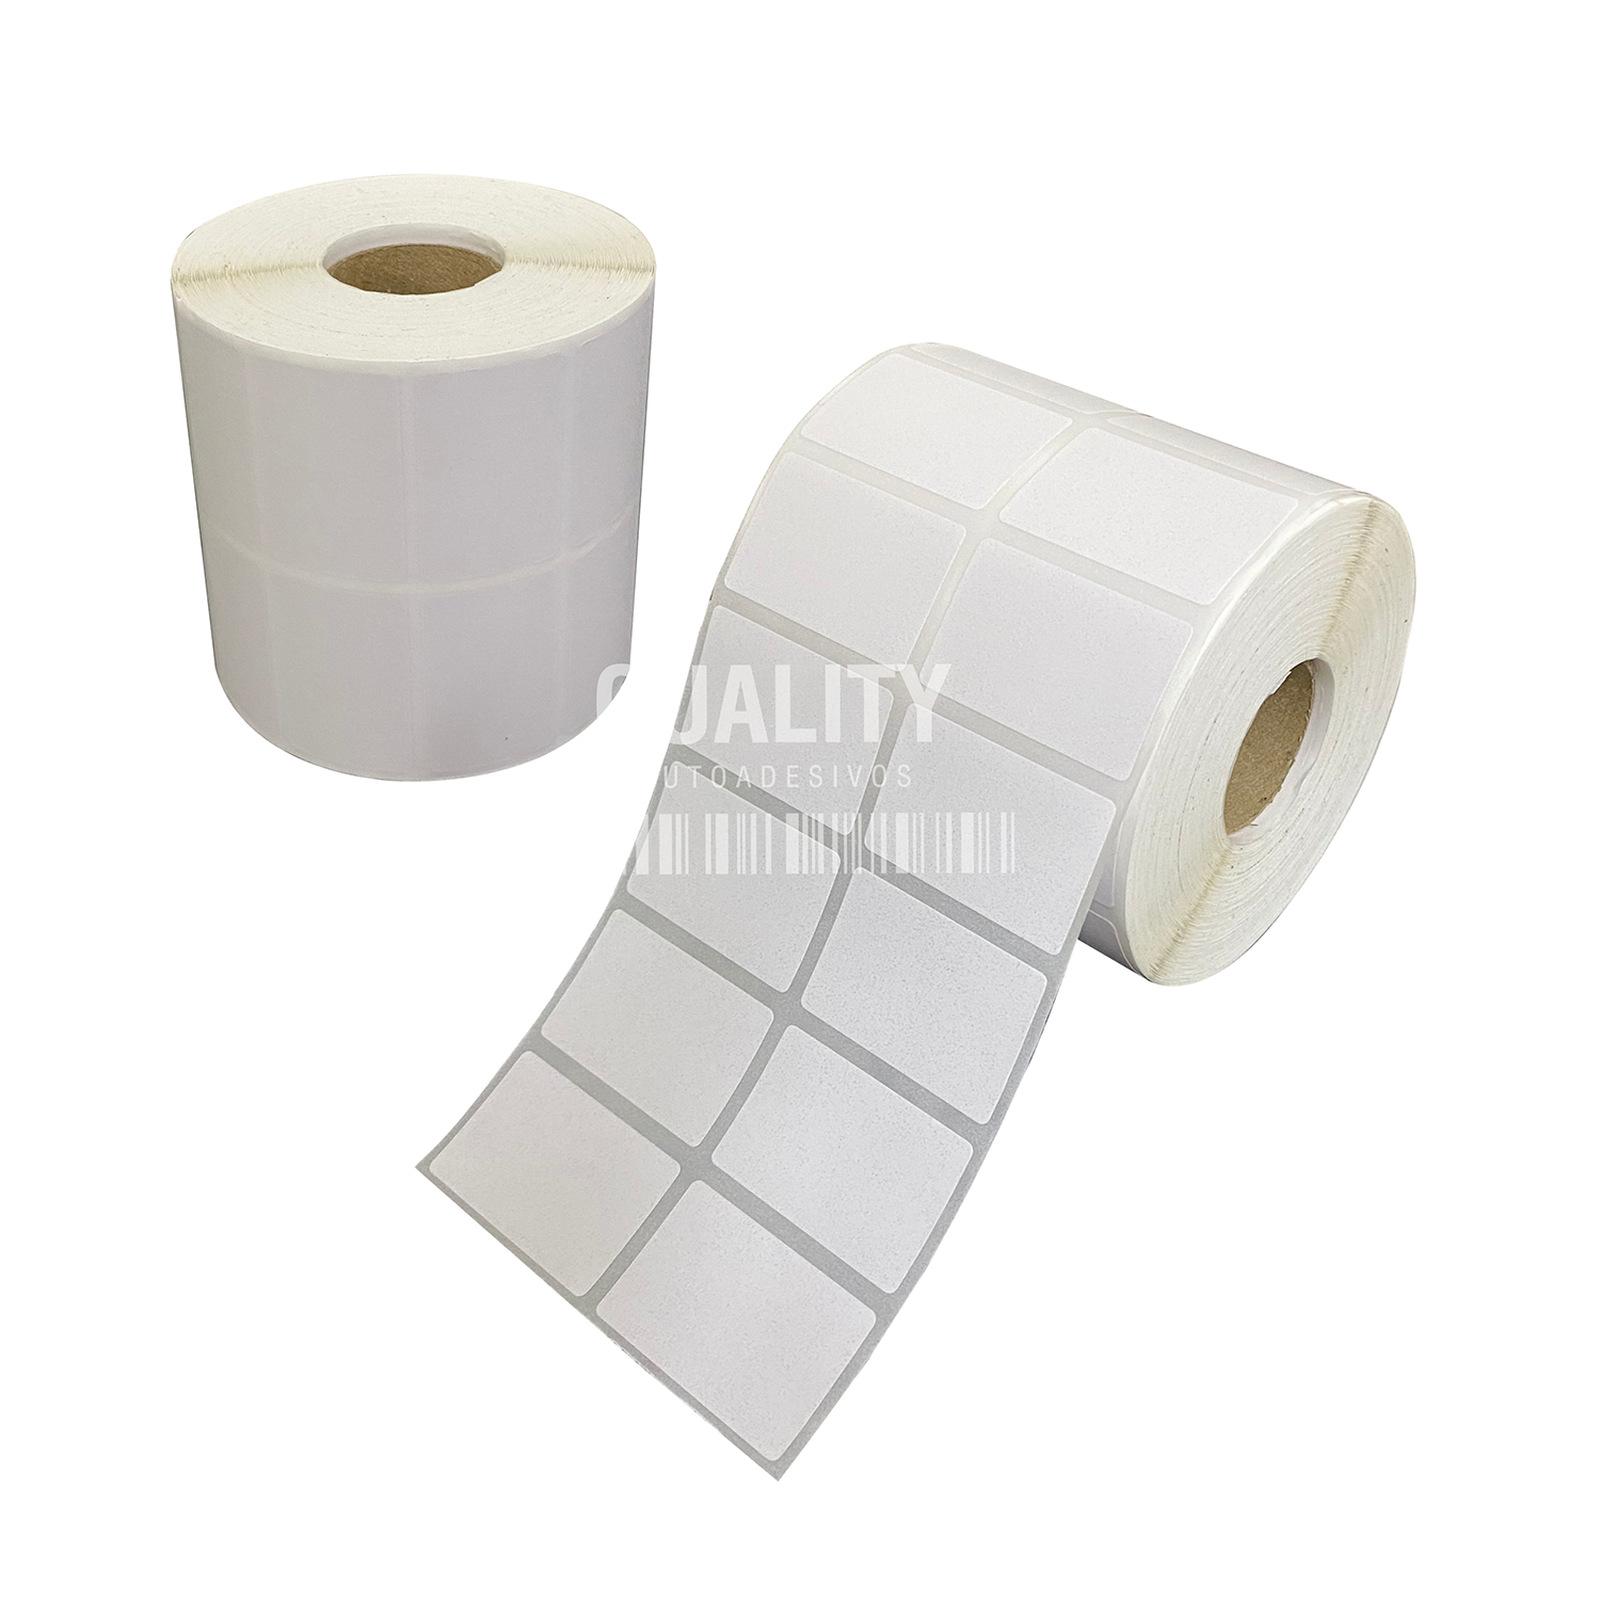 3000 Etiqueta Térmica 40x25mm 2 Colunas  - Etiqueta Certa